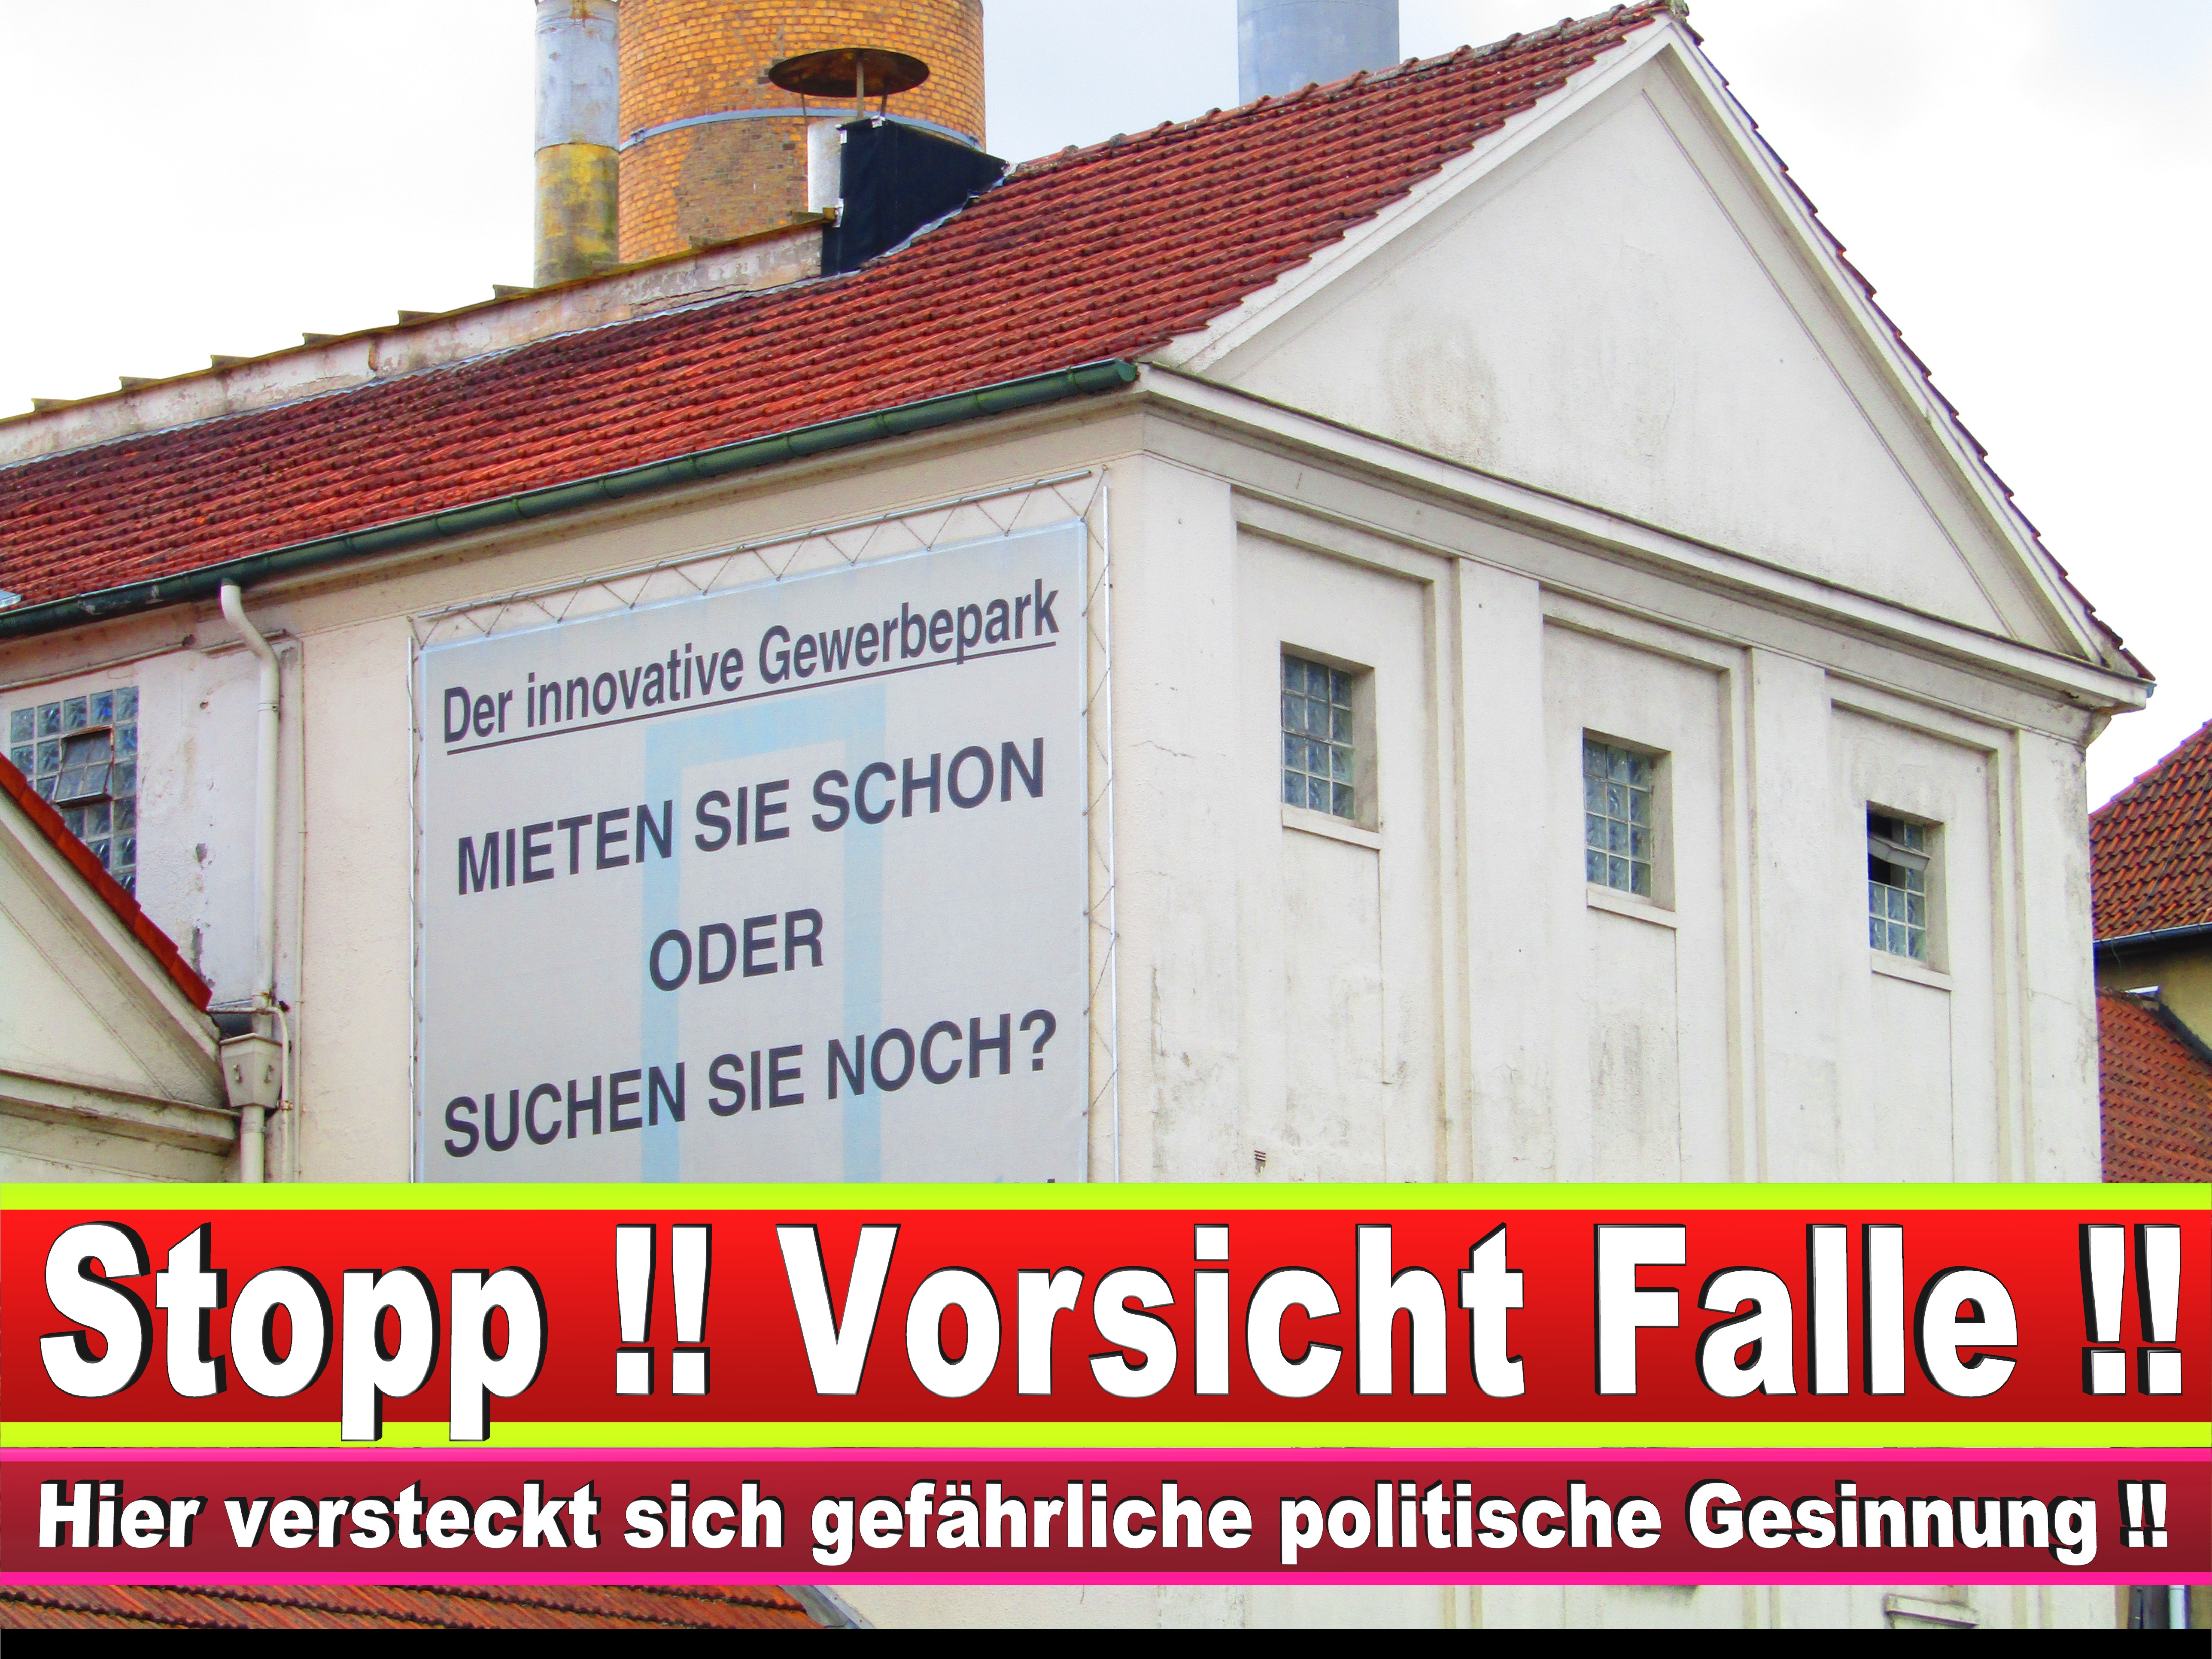 CWK KUNSTSTOFFRECYCLING GMBH Christoph Wybranietz Nordwestring 10 Augustdorf